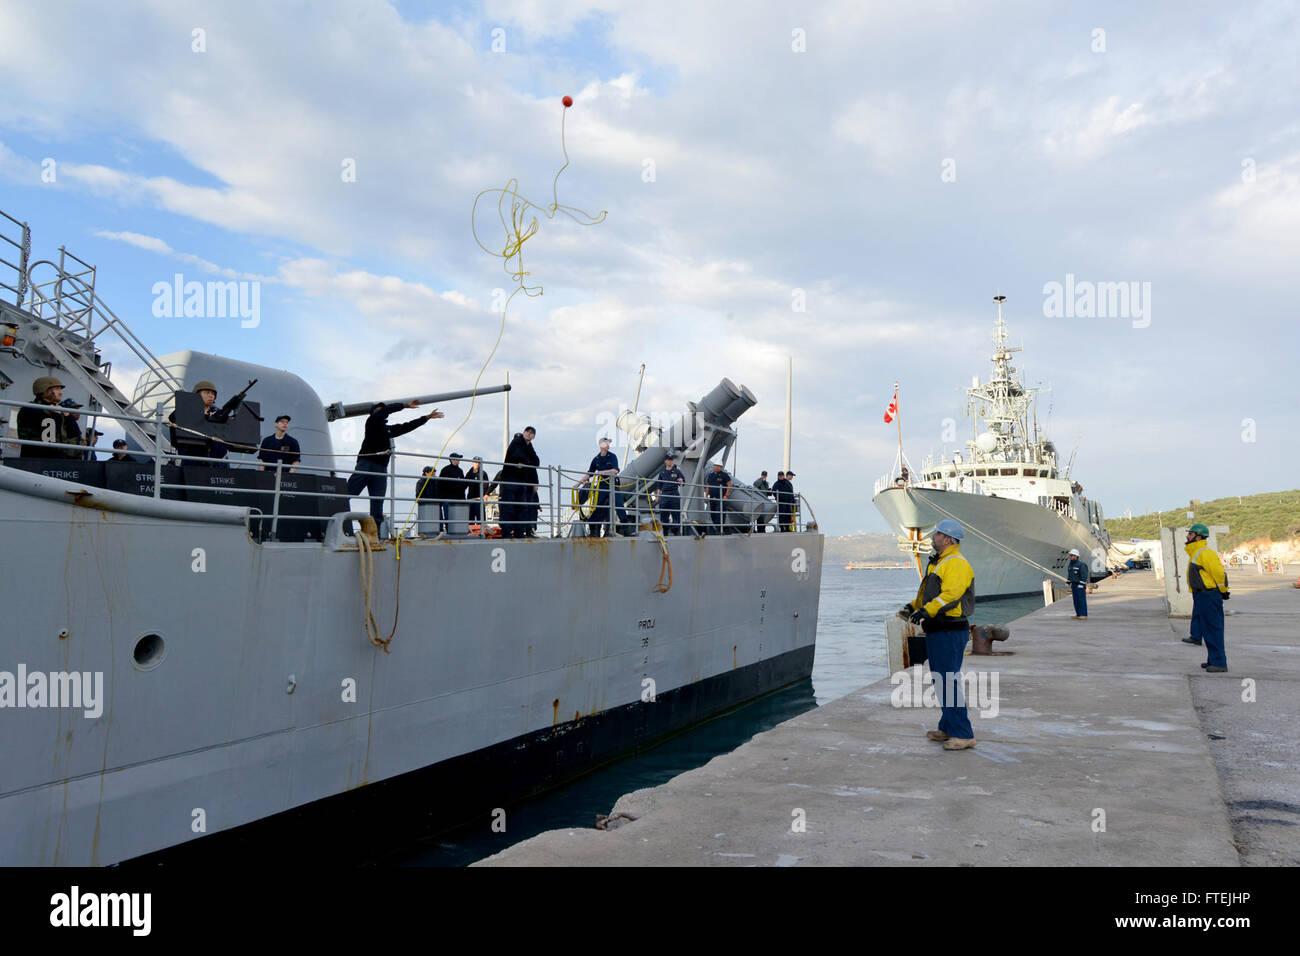 SOUDA BAY, Greece (Dec. 10, 2014) USS Leyte Gulf (CG-55) moors at Marathi NATO pier facility, ahead of HMCS Toronto - Stock Image